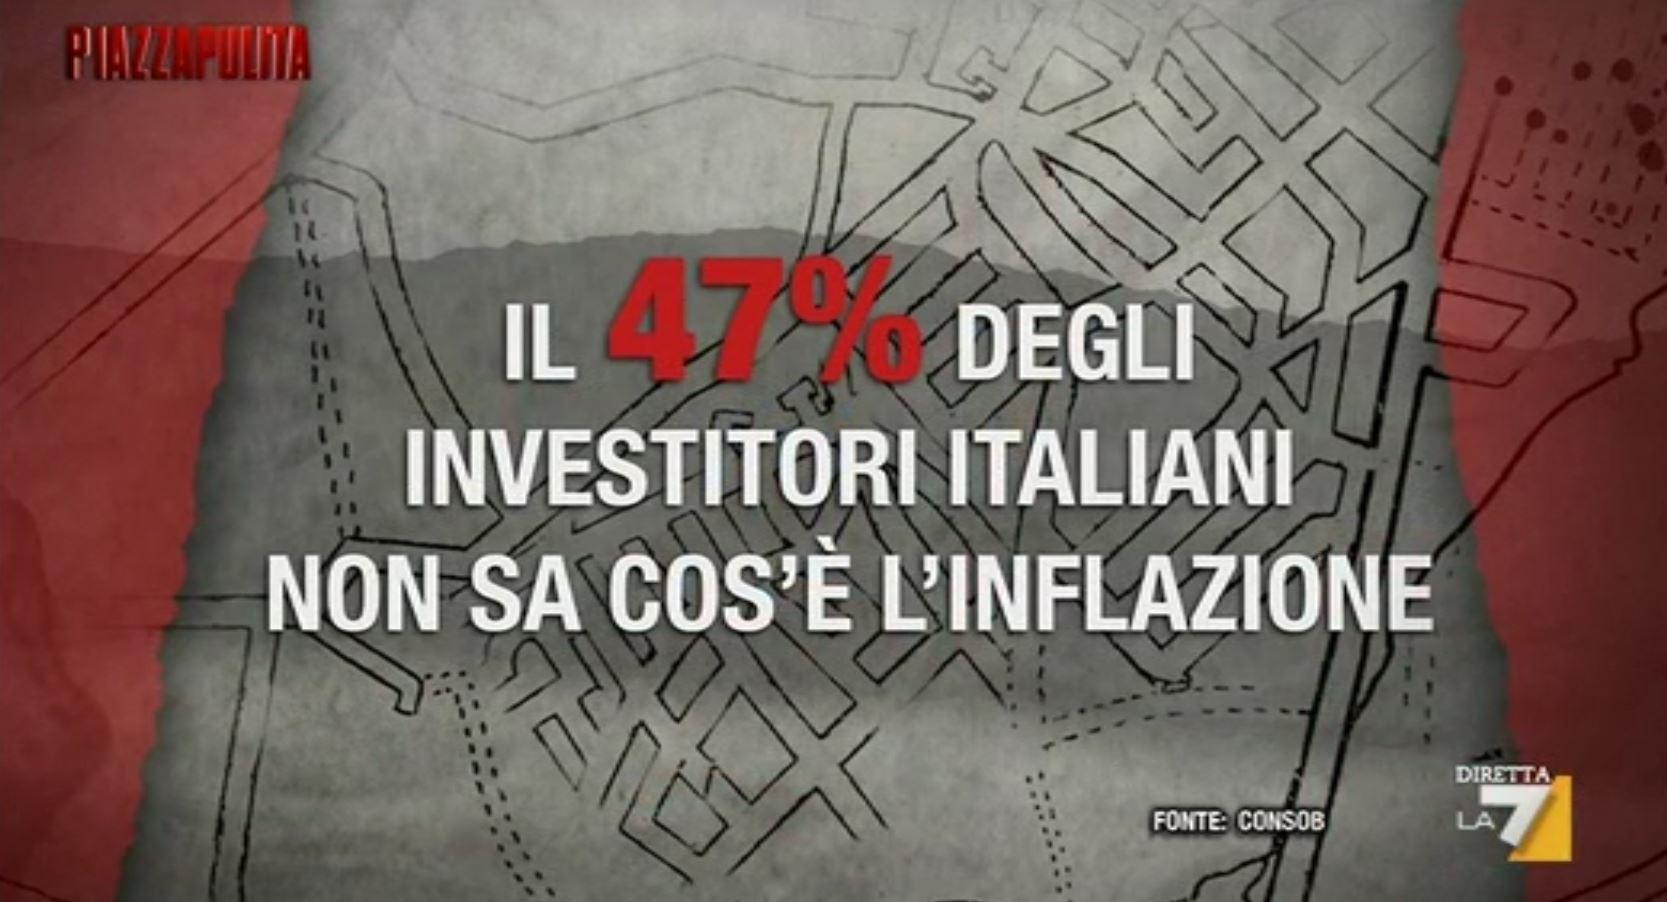 quali sono investimenti sicuri piazzapulita - 1